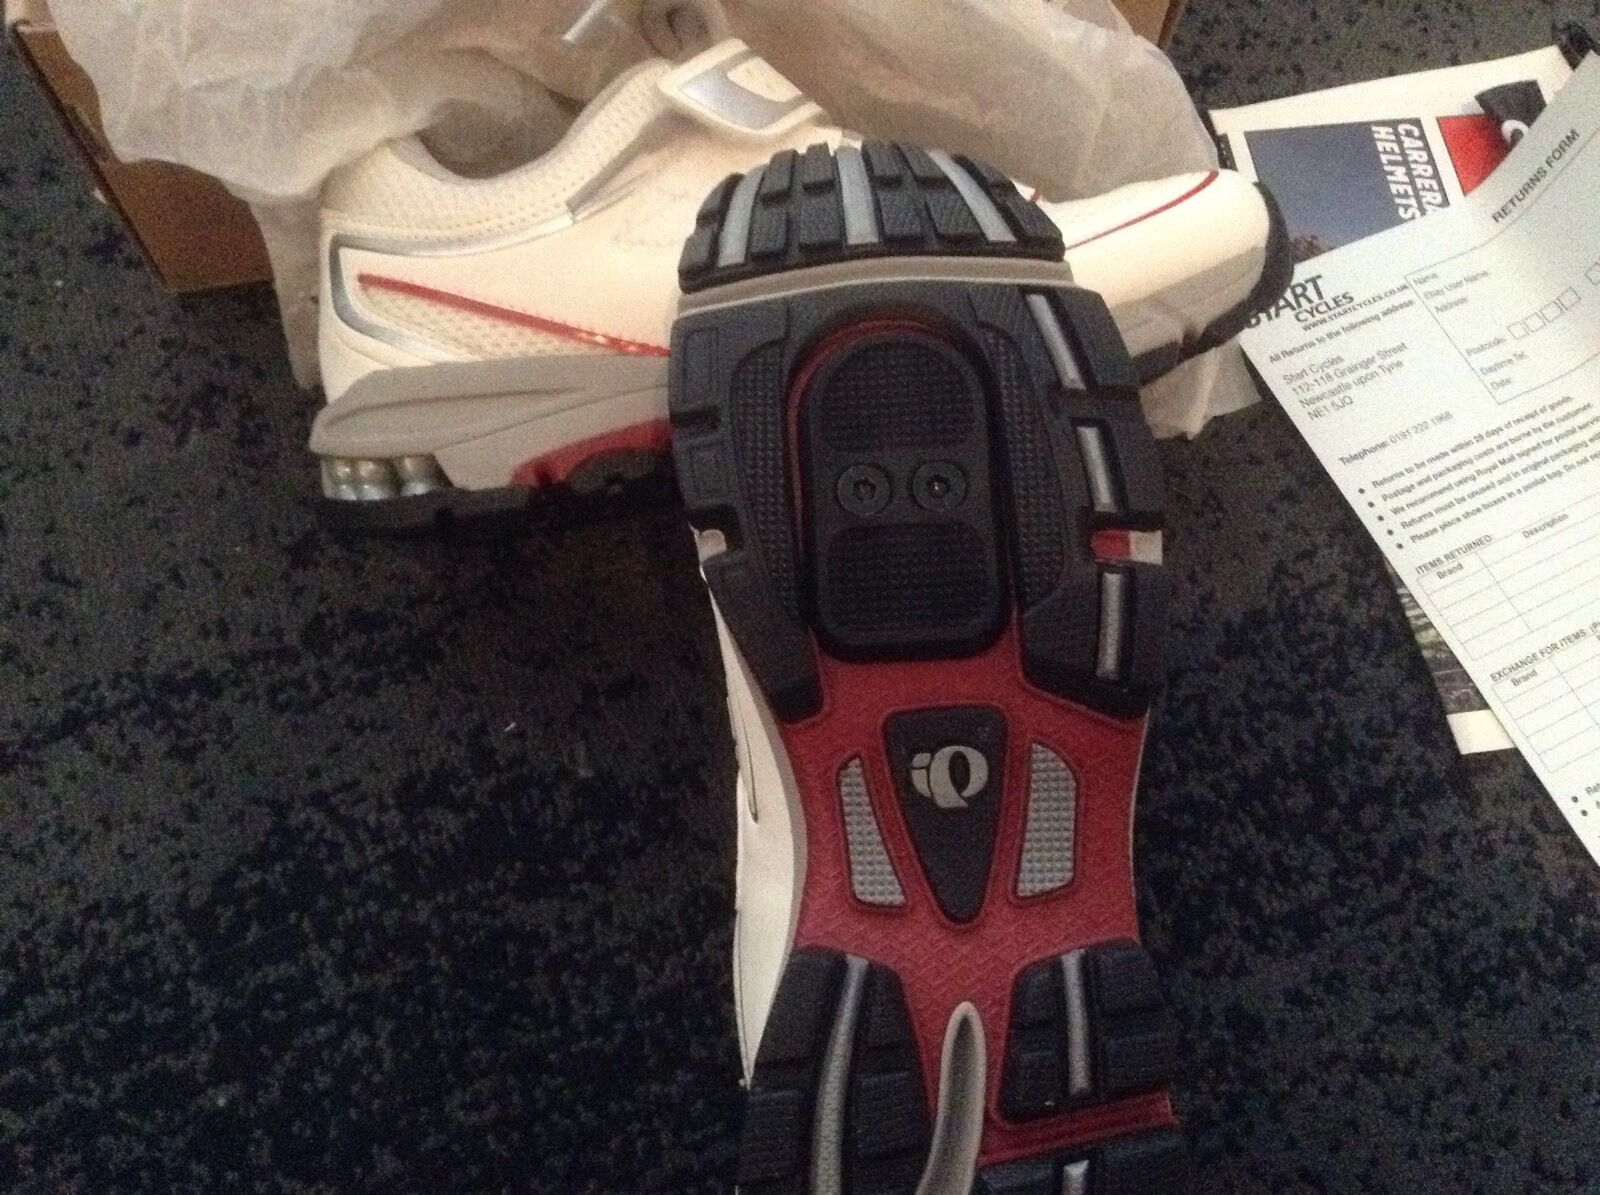 PEARL IZUMI Ciclismo Scarpe Taglia Nuovo di di di Zecca UK4 Bianco EU37 * 5b0ab6